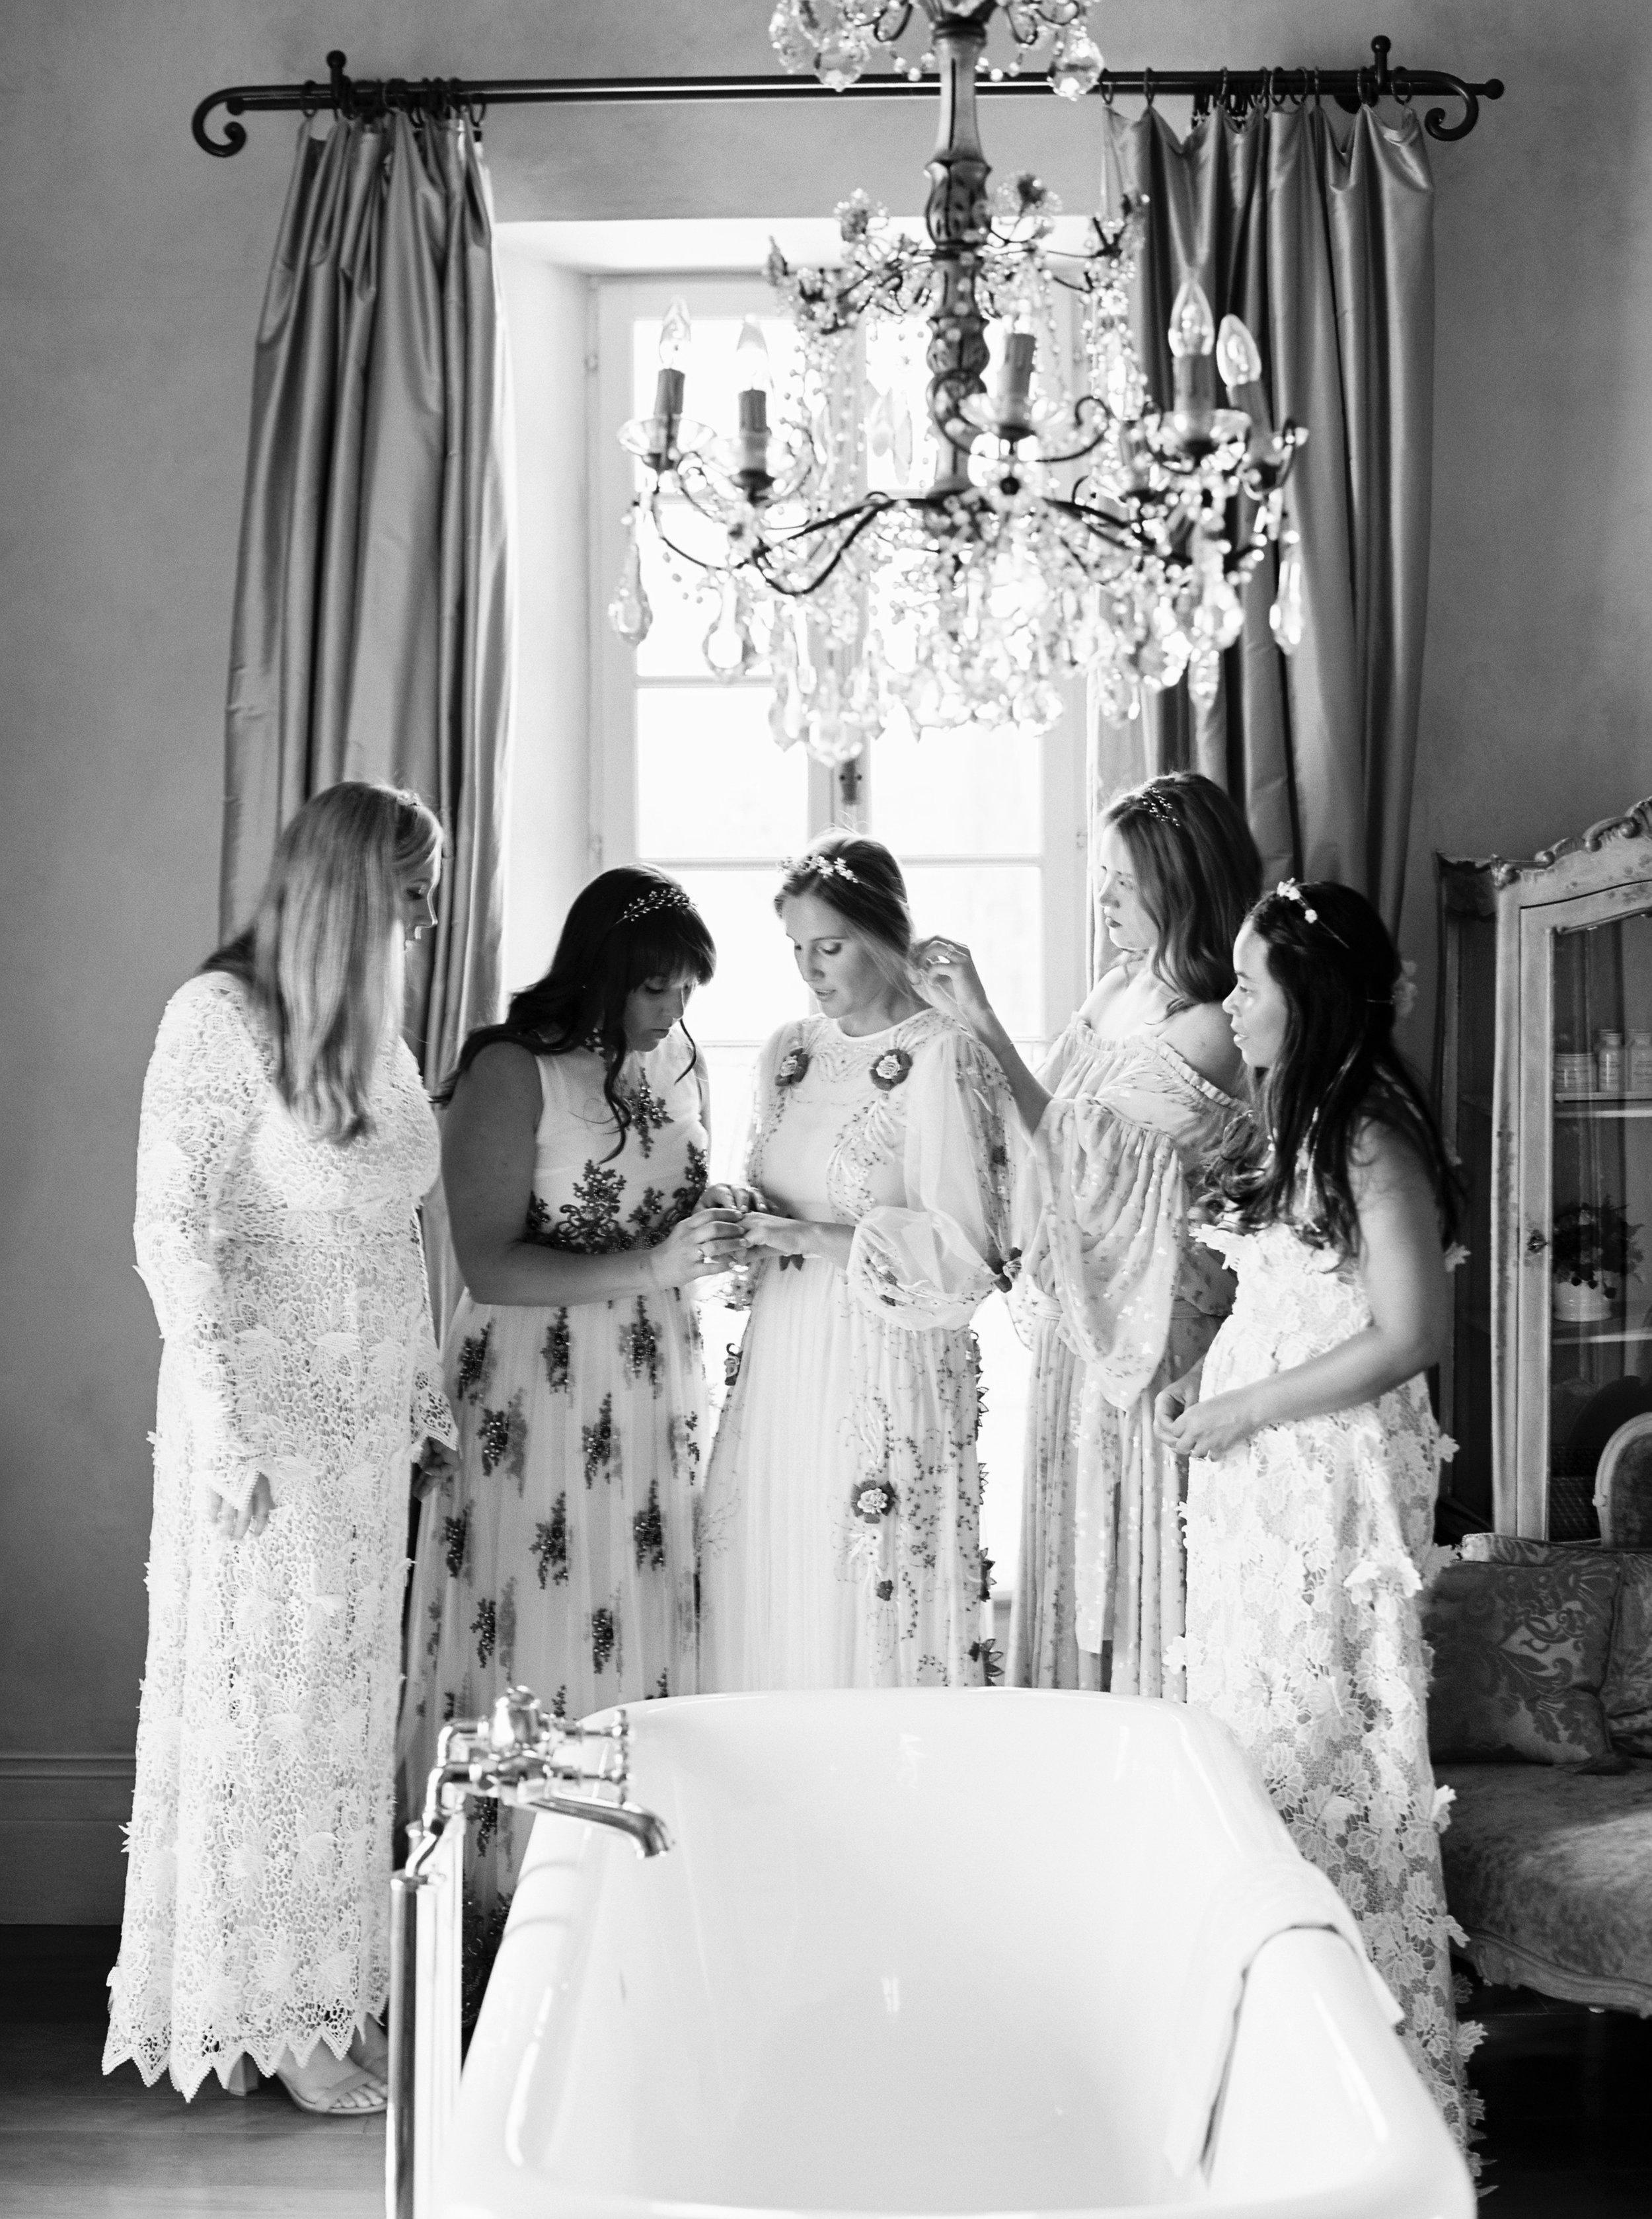 Kyle John l Fine Art Wedding Photography l Chicago, Copenhagen, California, New York, Destination l Blog l Alexis and Zach_Borgo Santo Pietro_Italy_Tuscany_30